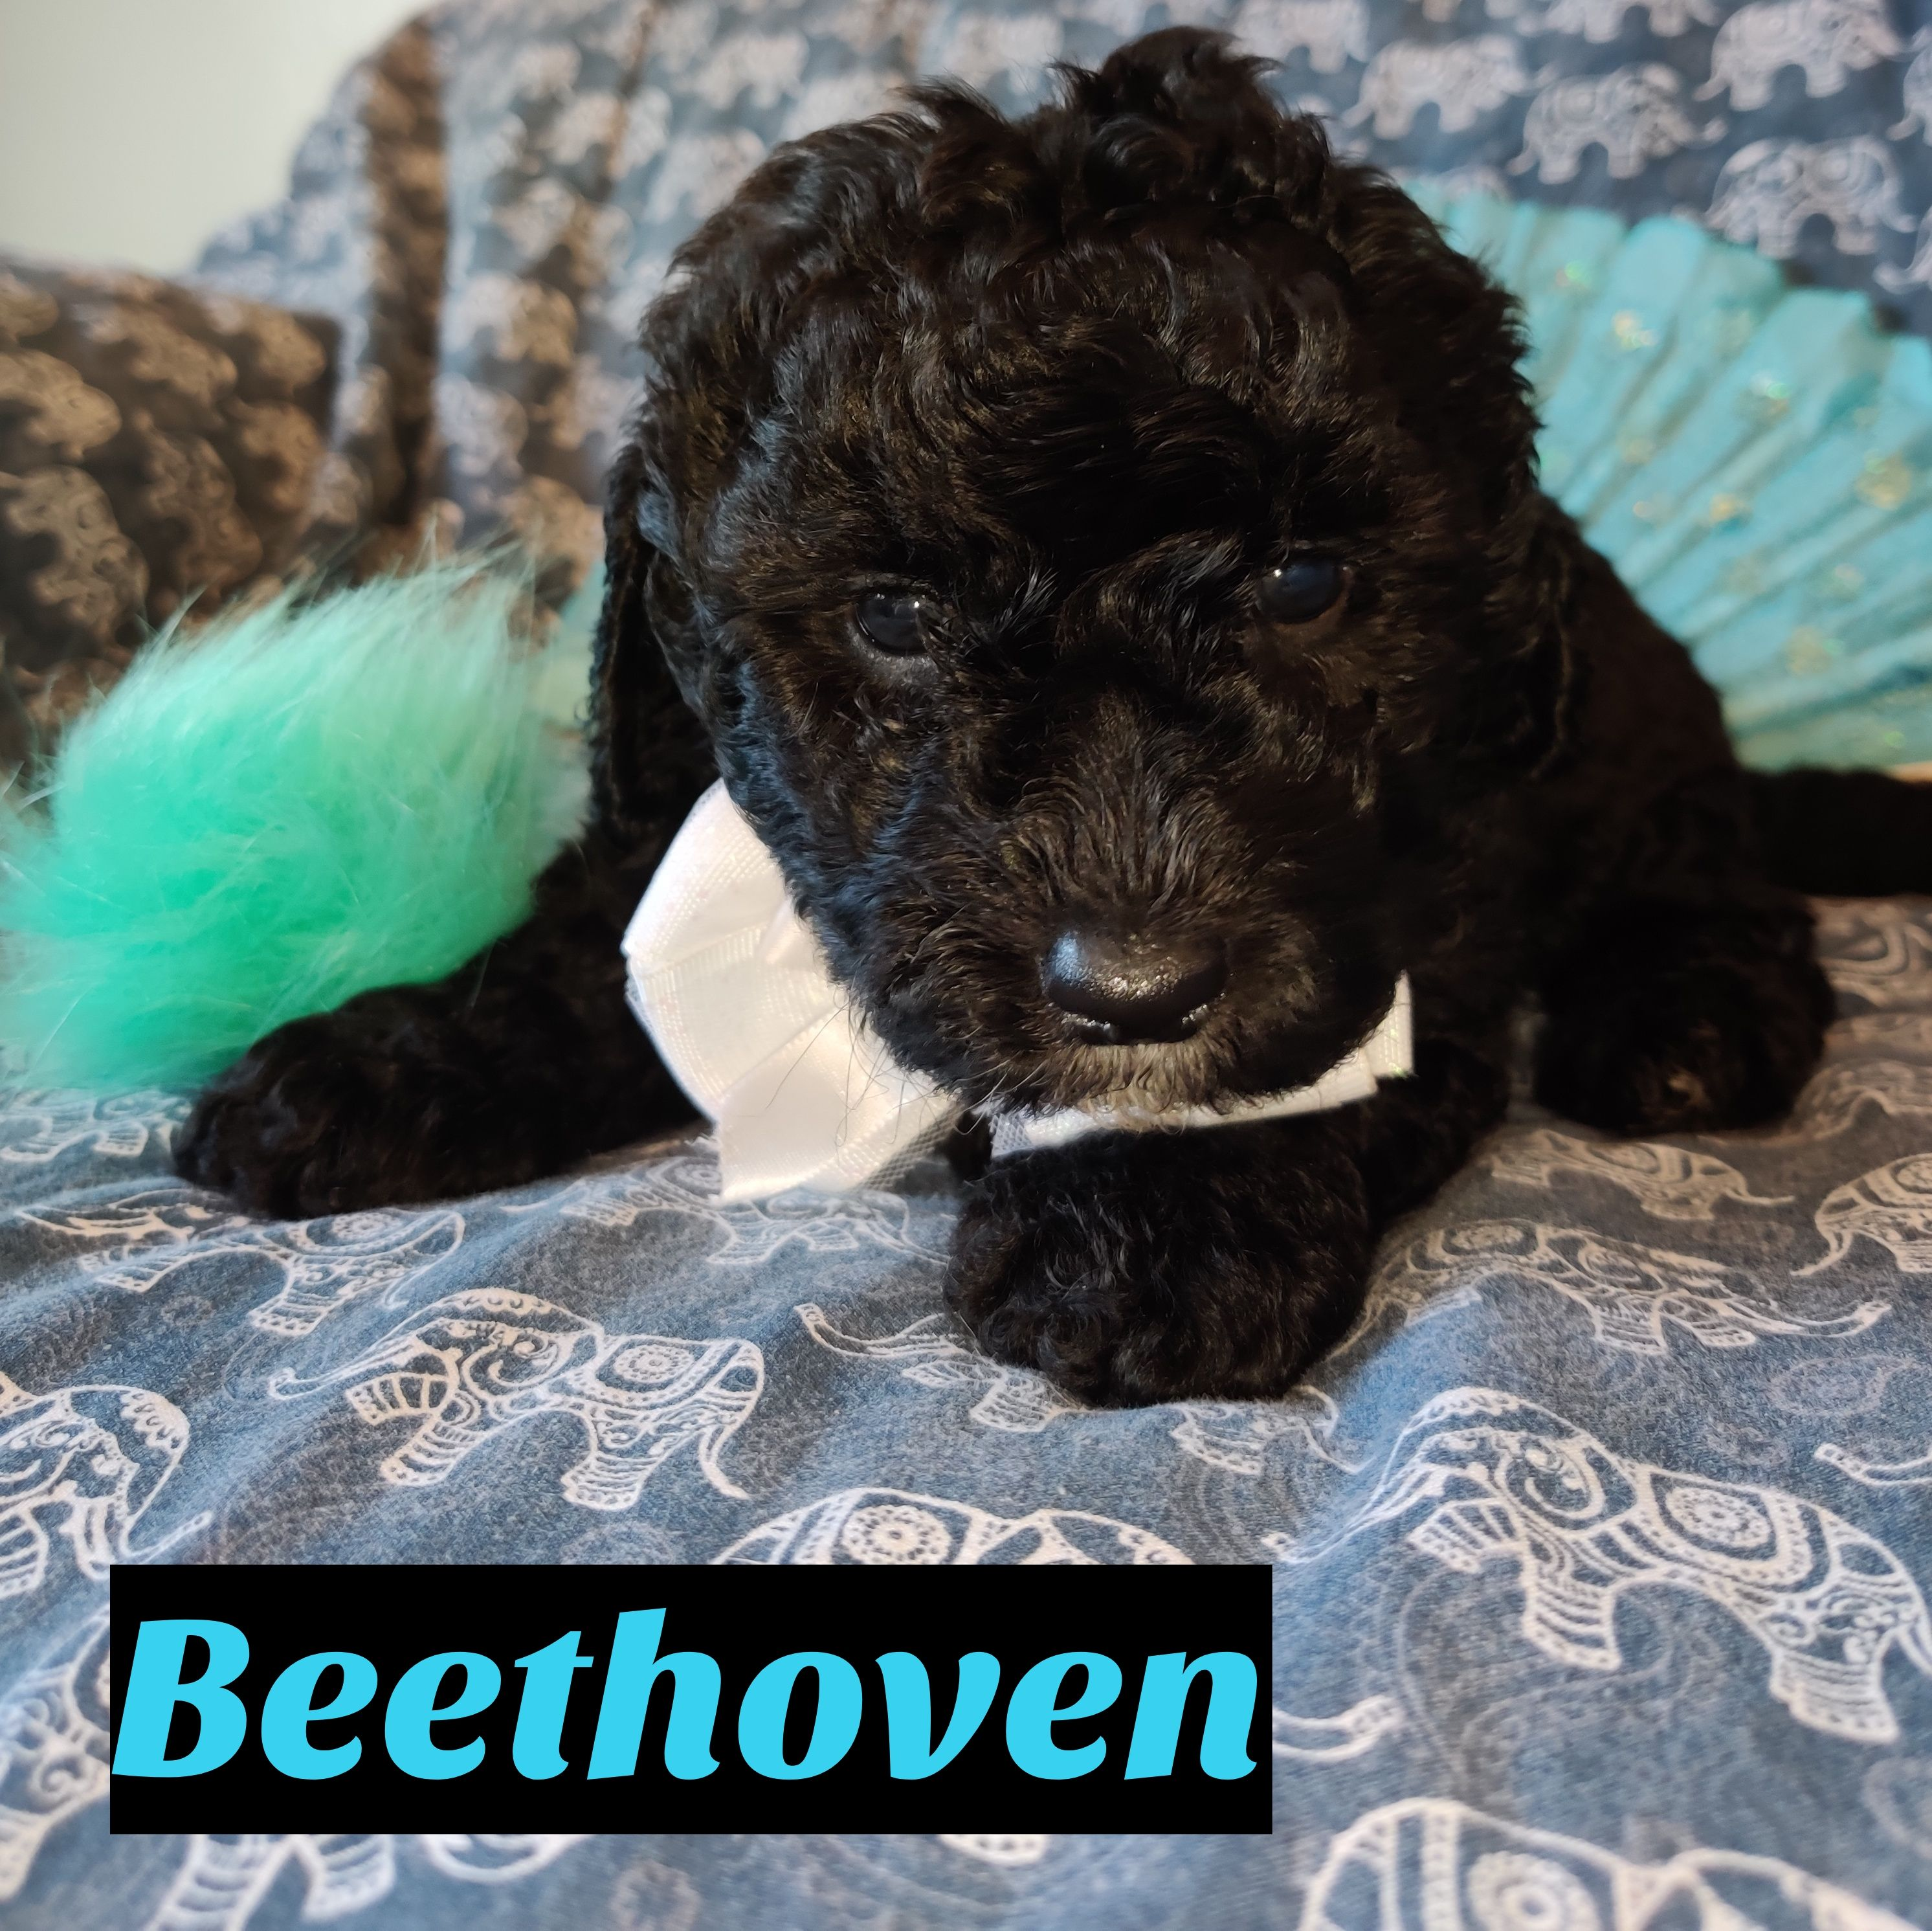 Beethoven Mini Goldendoodle doggie for sale near Saint